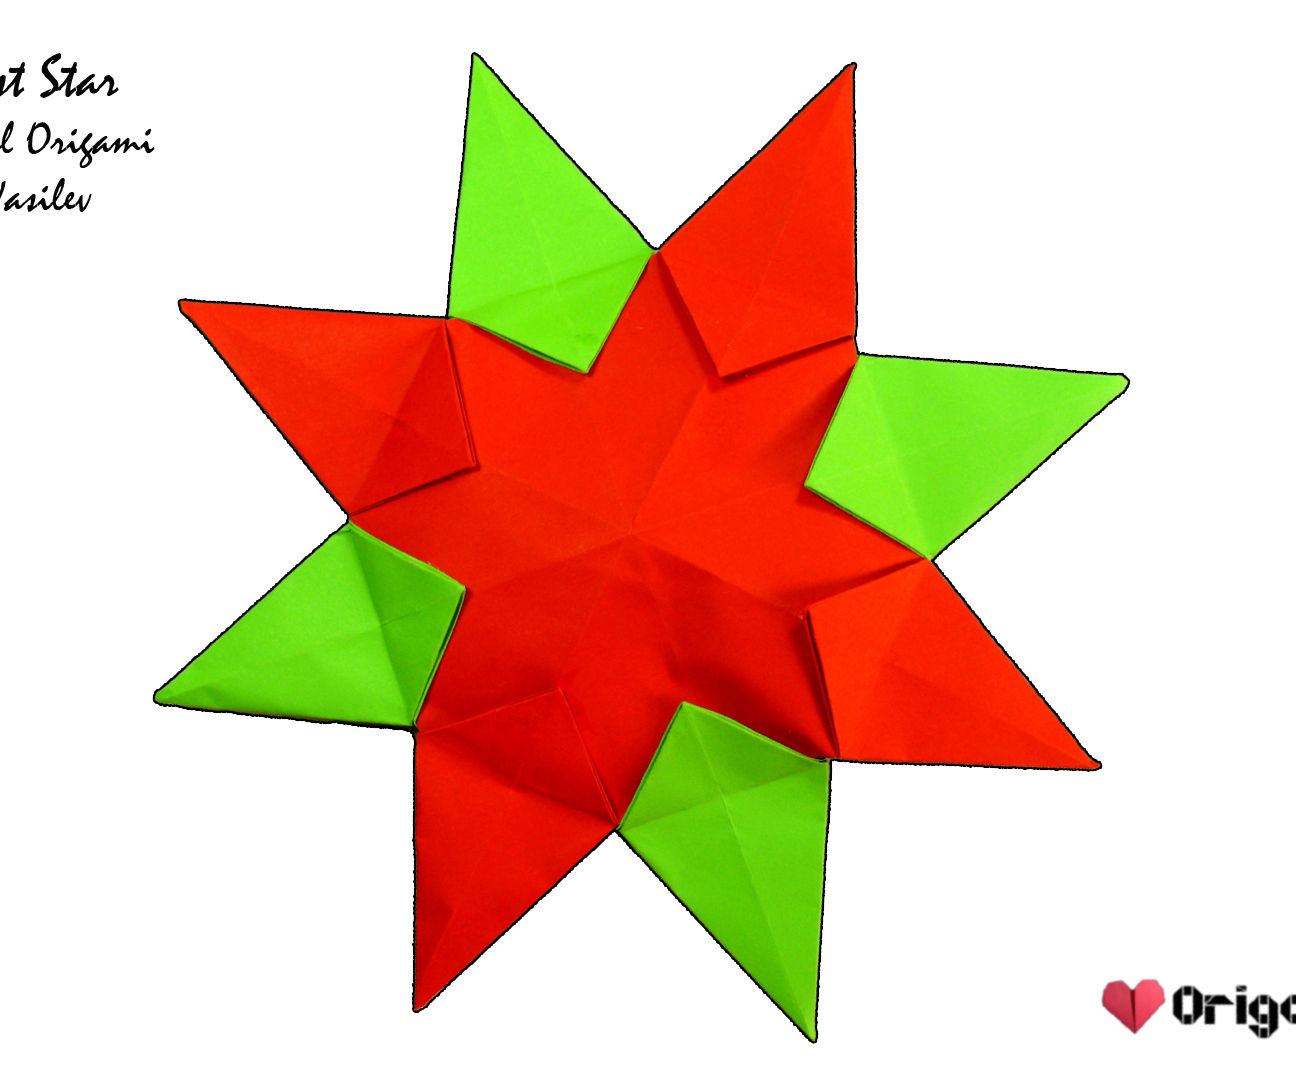 Origami Sunburst Star Video Tutorial